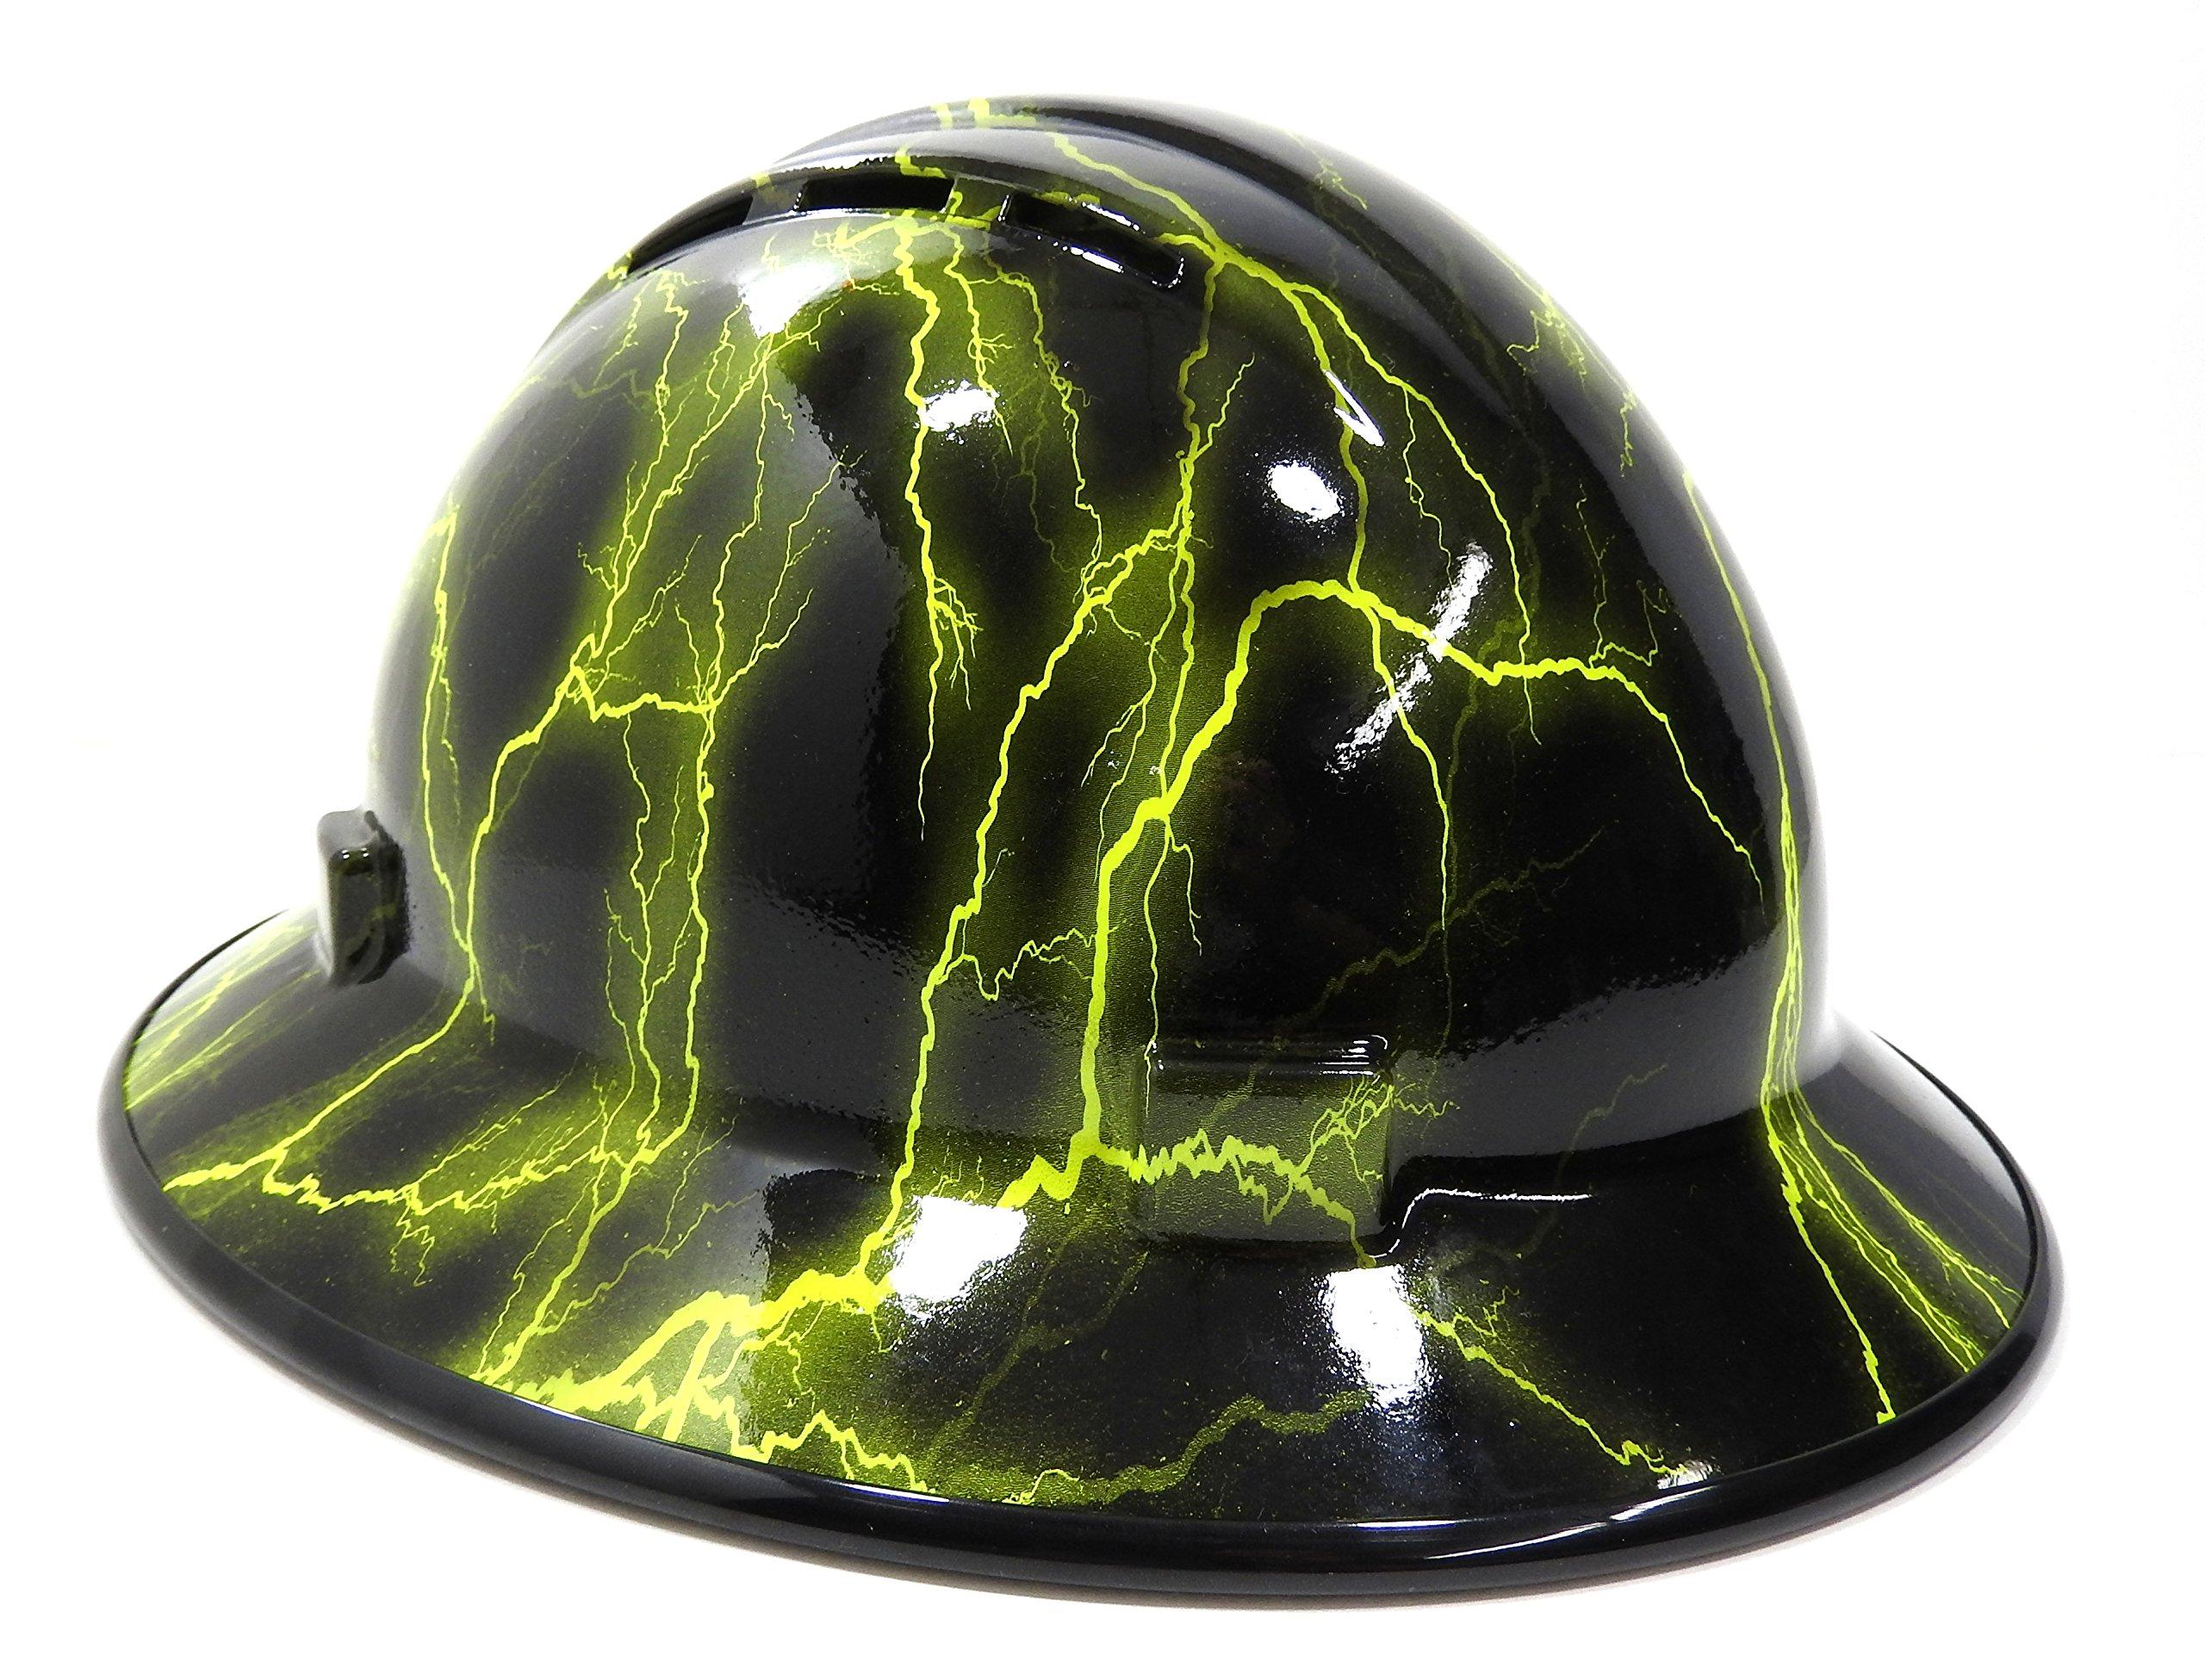 HardHatGear Custom Hydro Dipped VENTED Full Brim Hard Hat in 'Hi Viz Lightning' - Made in USA by Hardhatgear (Image #1)